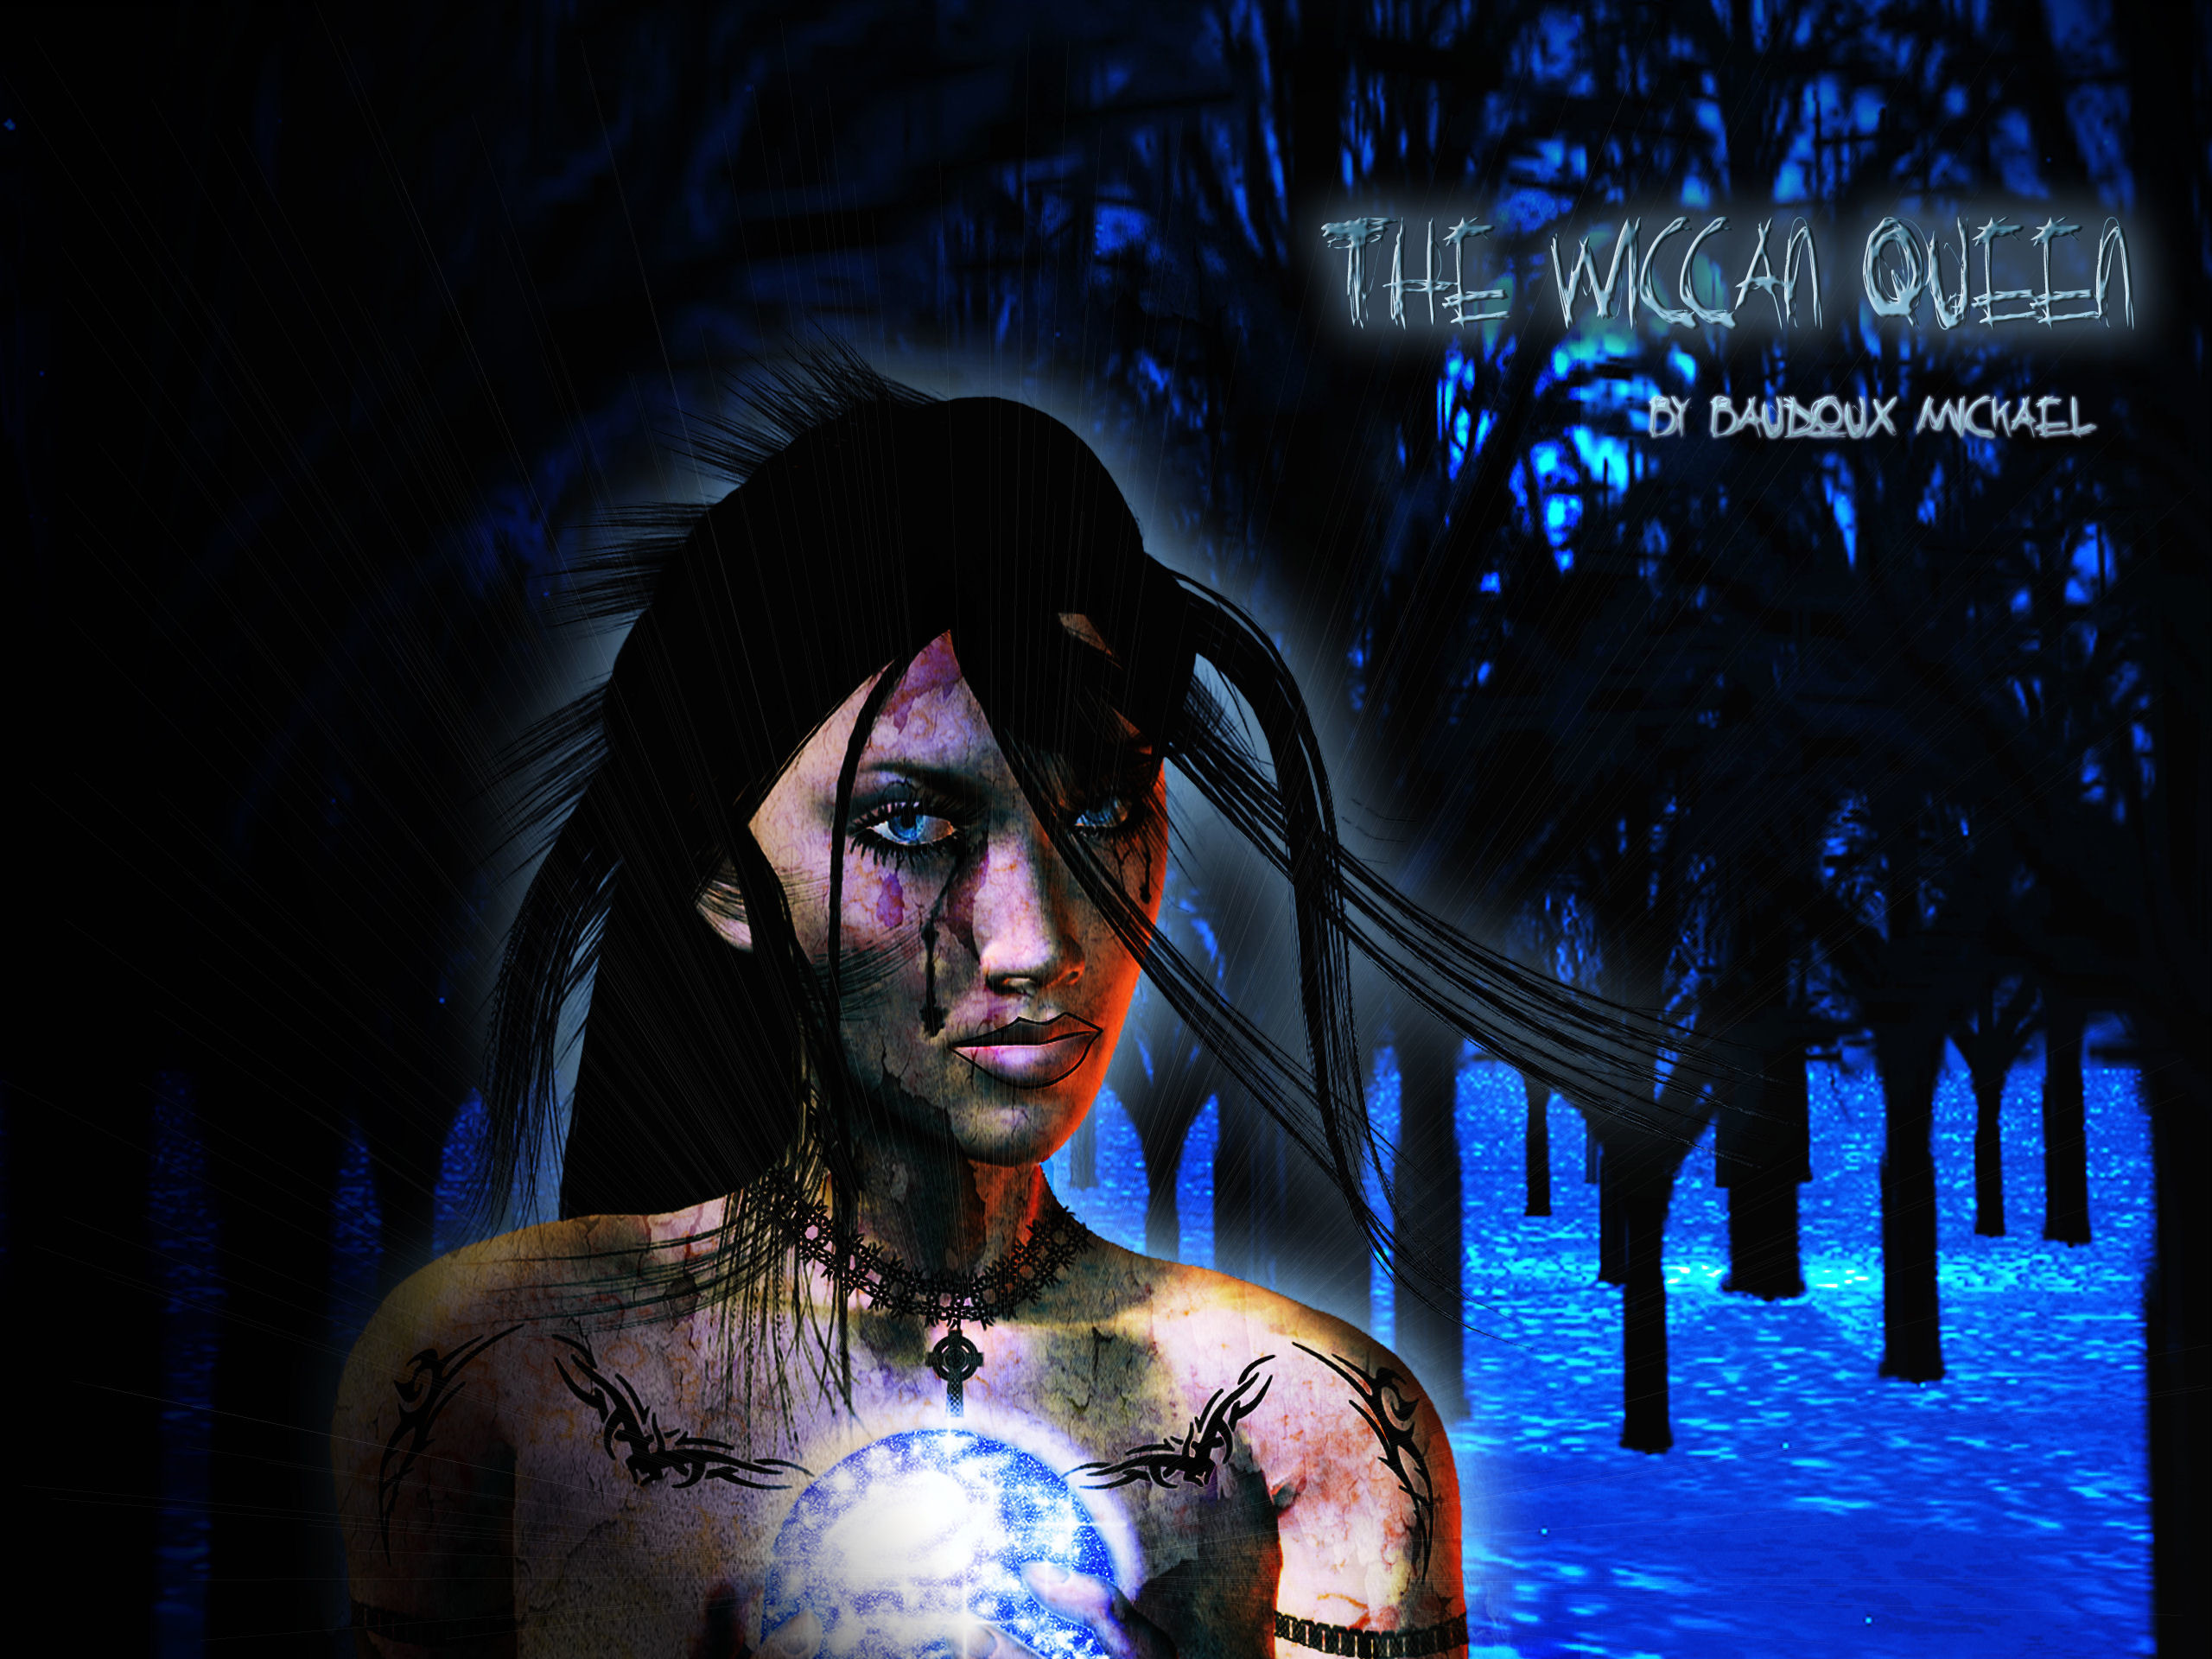 Background wallpaper, The wiccan Queen